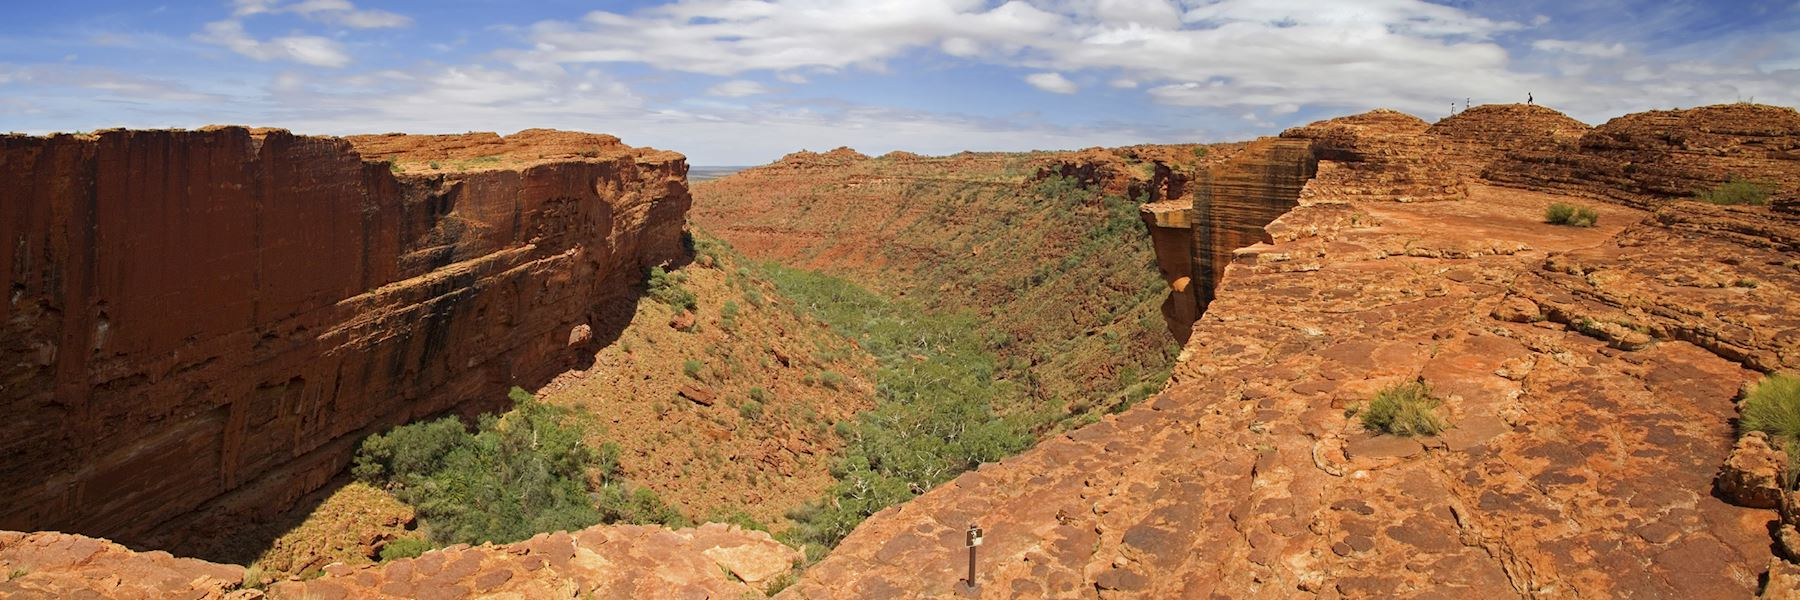 Visit Kings Canyon & Watarrka National Park, Australia